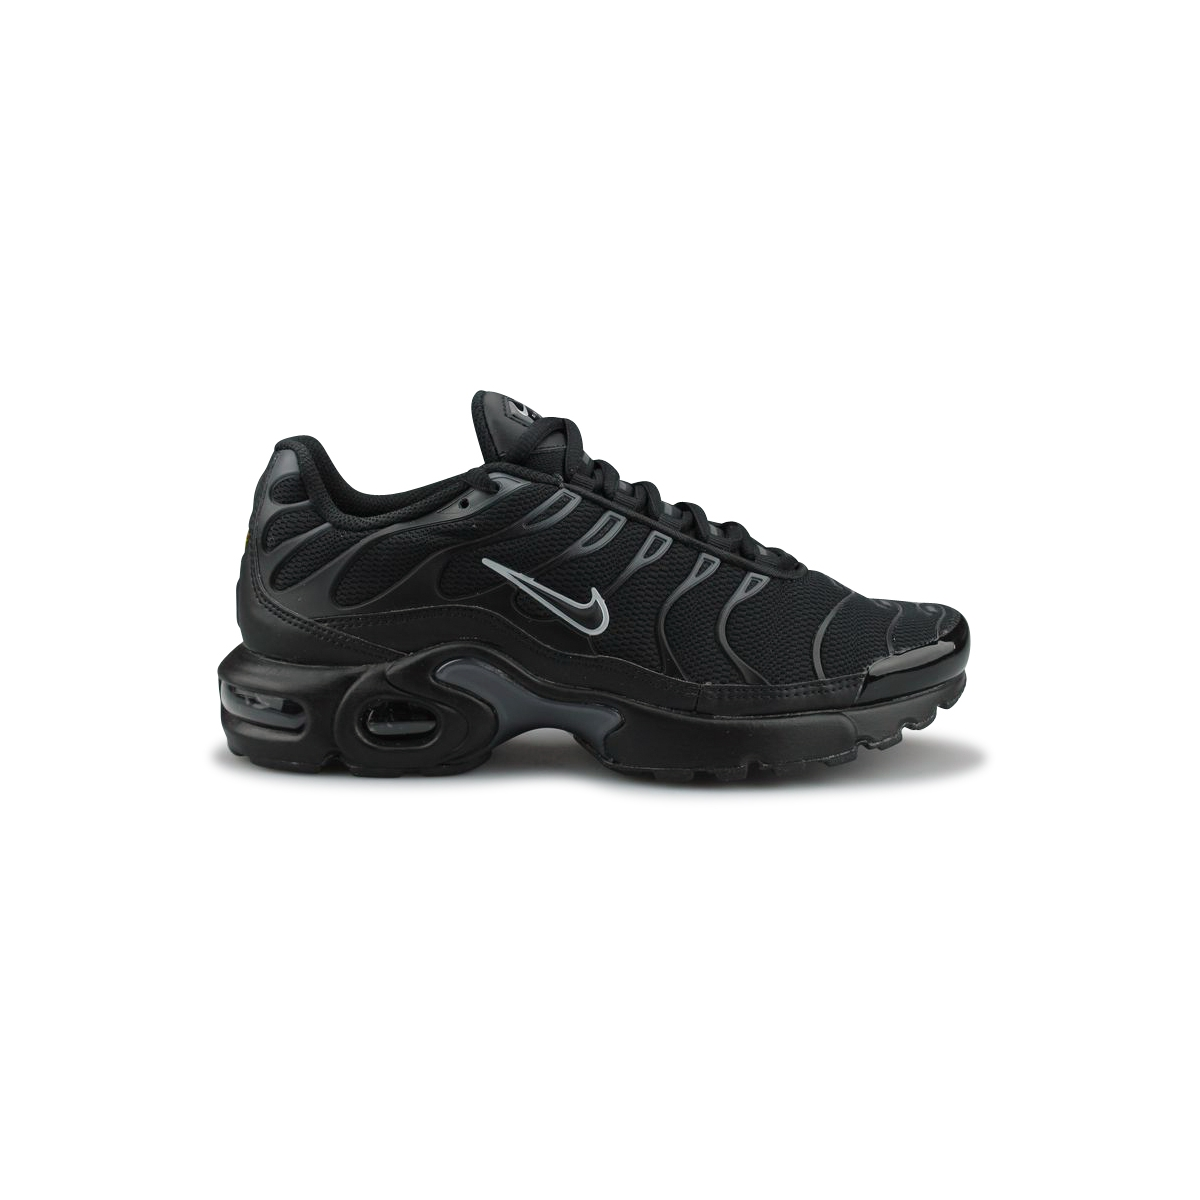 Basket Nike Air Max 90 Ltr Junior Fushia 833376 603 – achat